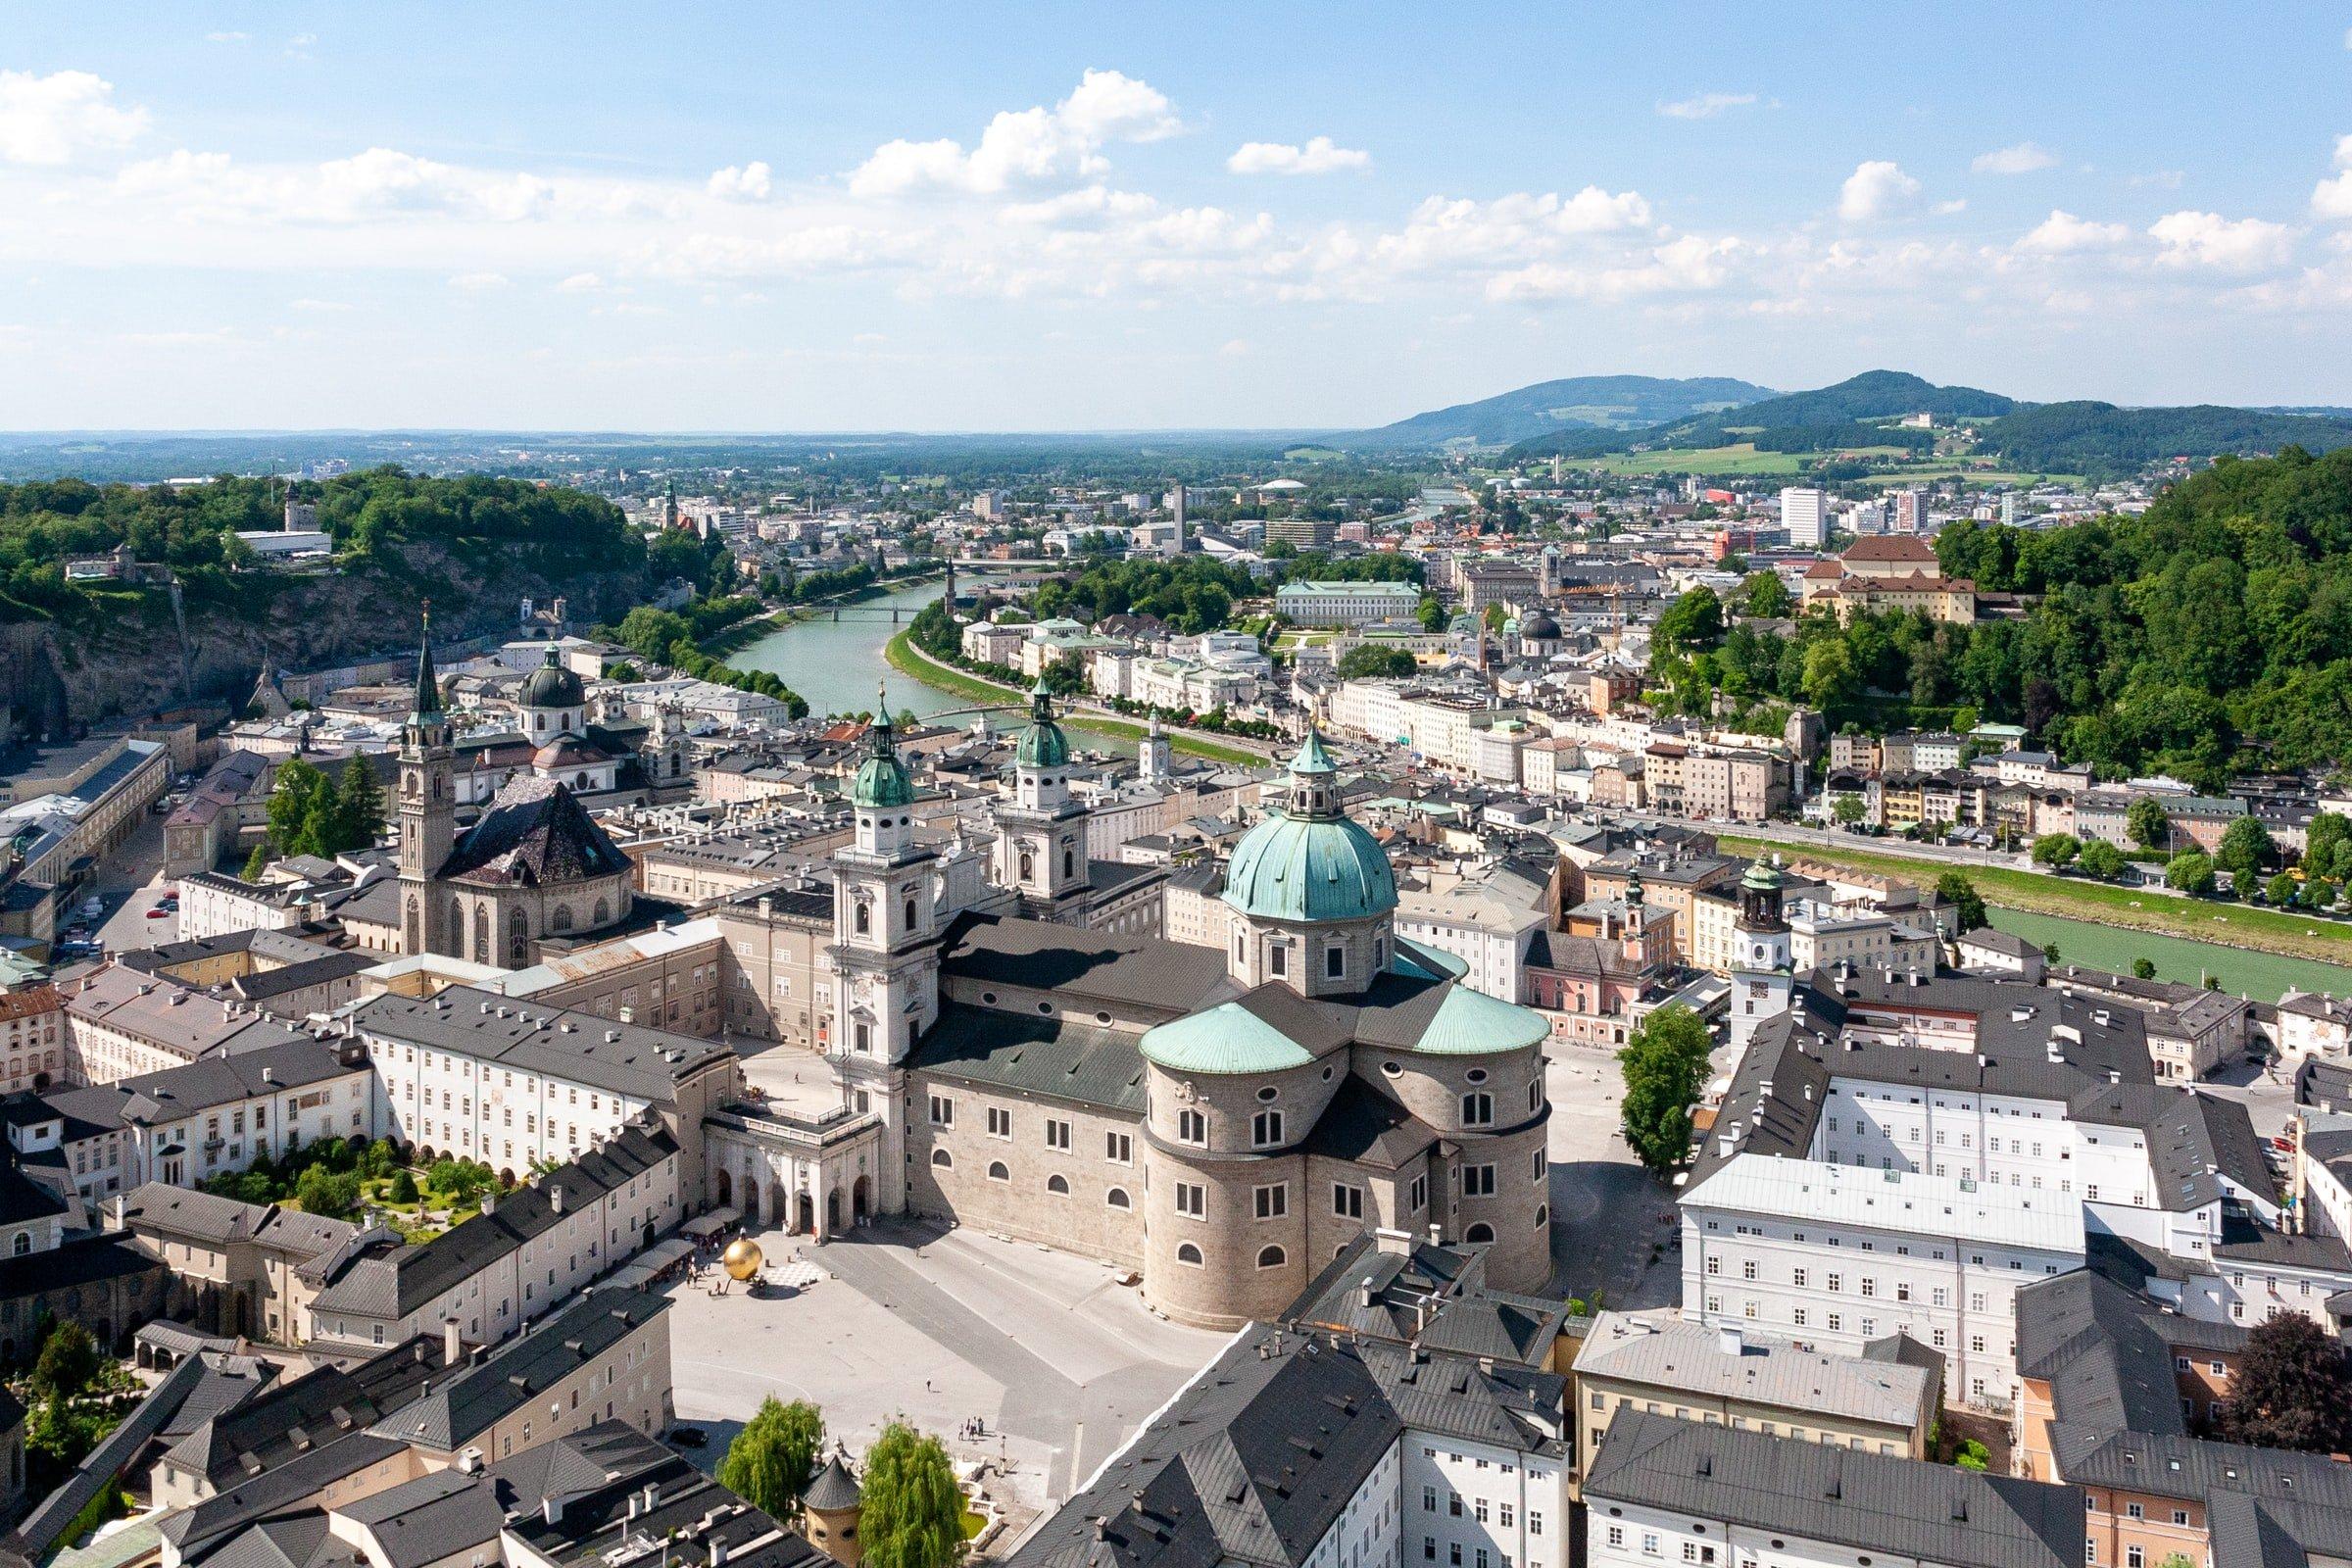 Salzburg (photo: Dimitry Anikin, Unsplash)